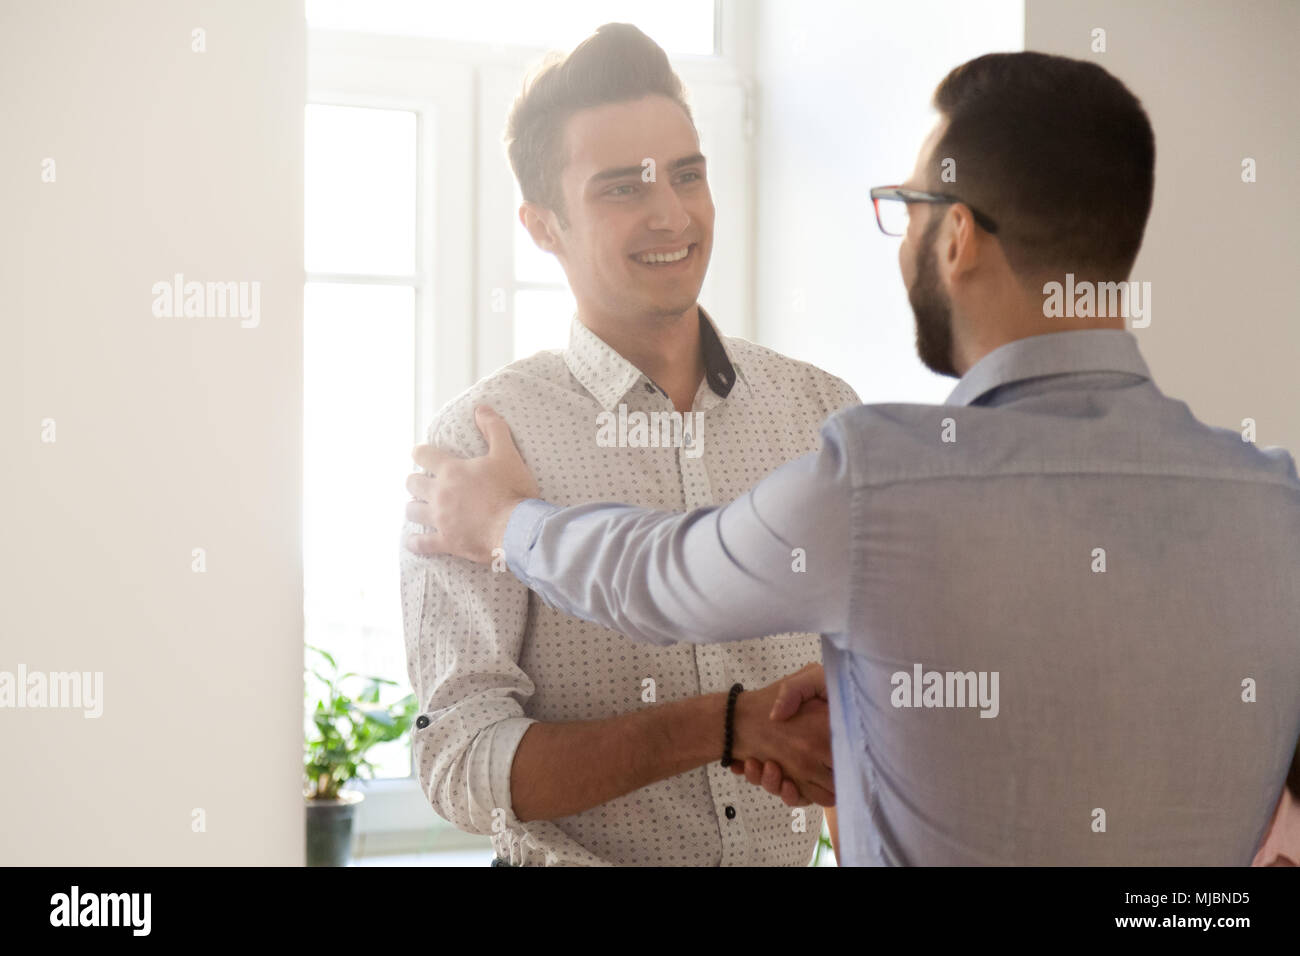 Grateful boss handshaking employee congratulating with job promo - Stock Image